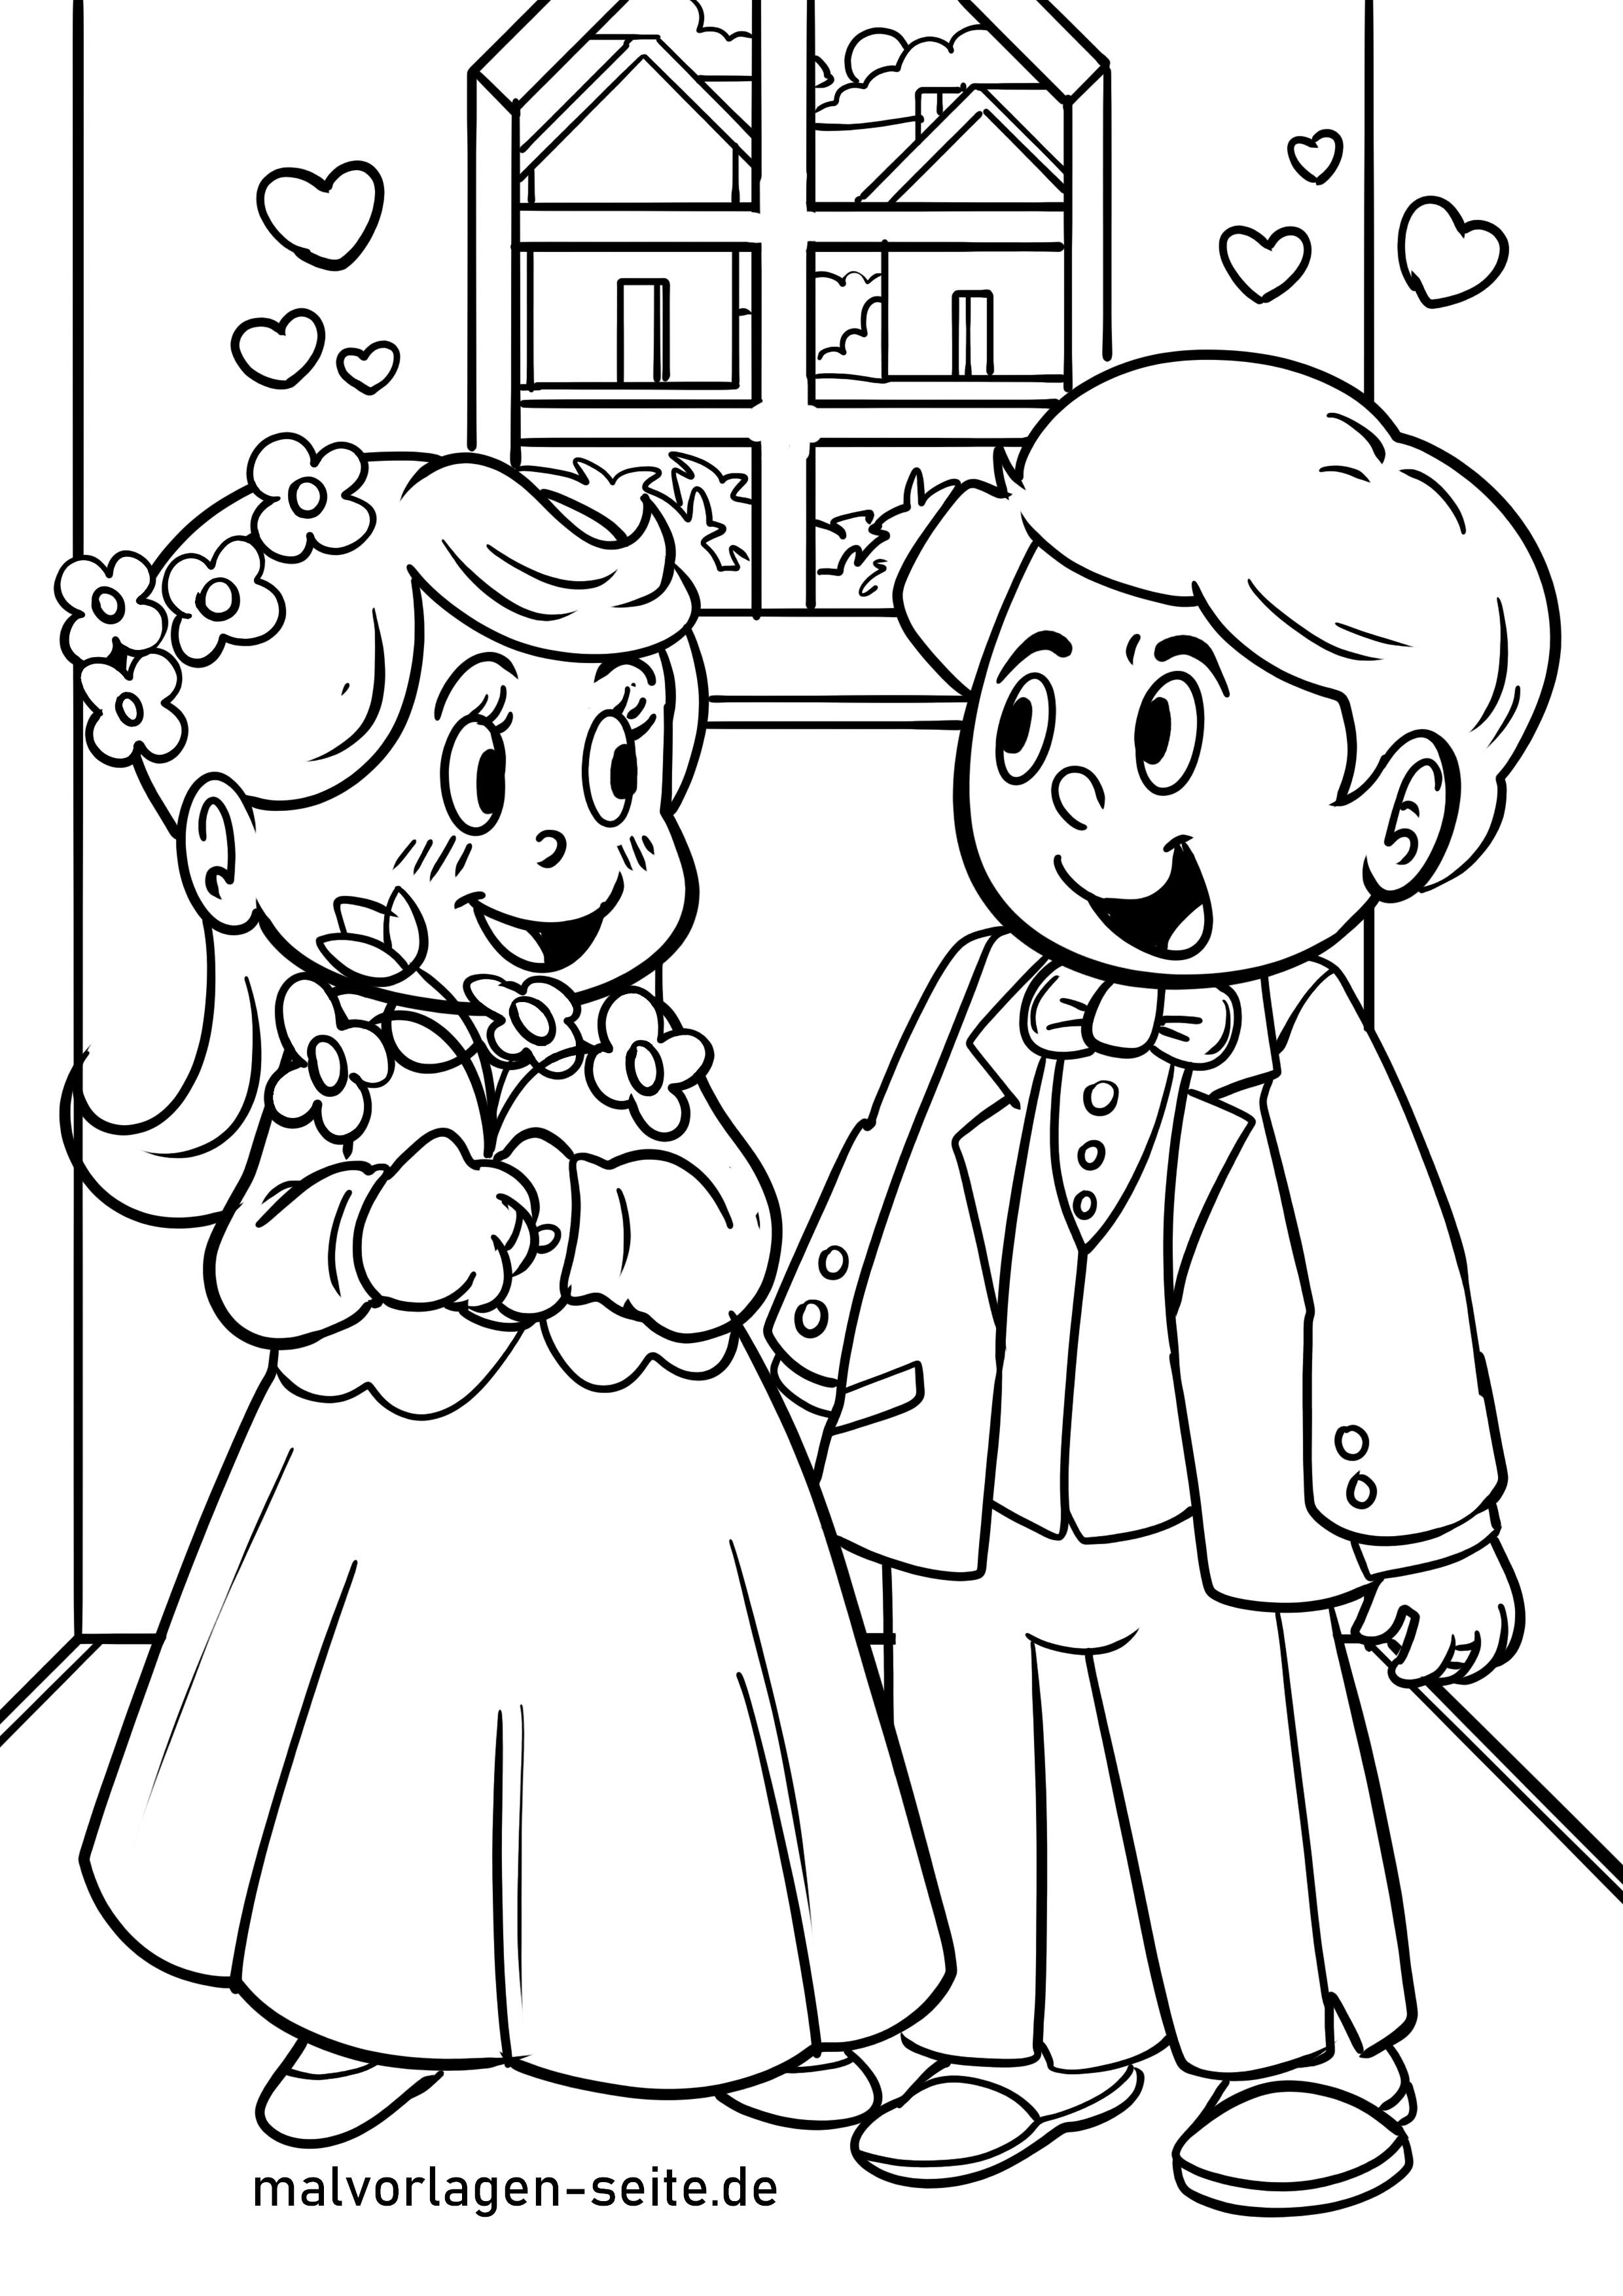 Hochzeit Malvorlagen Kinder - DISEGNI DA COLORARE